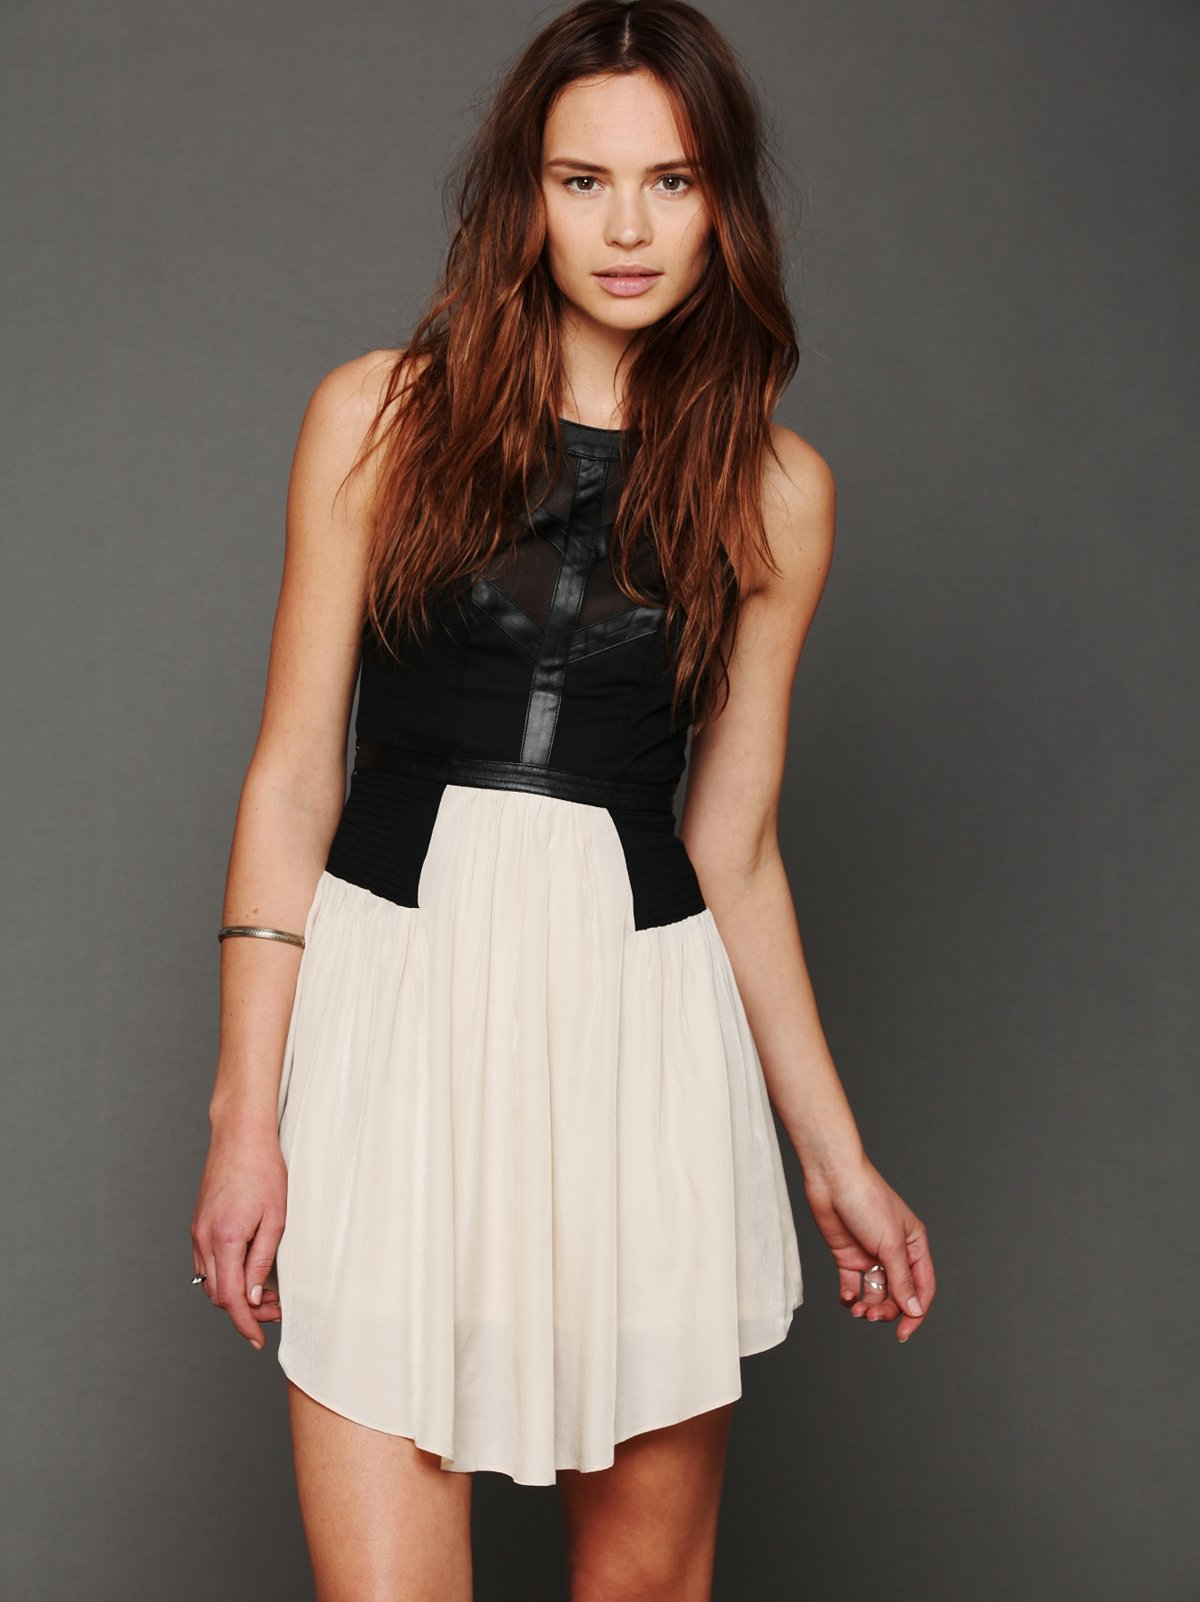 My Perogative Dress